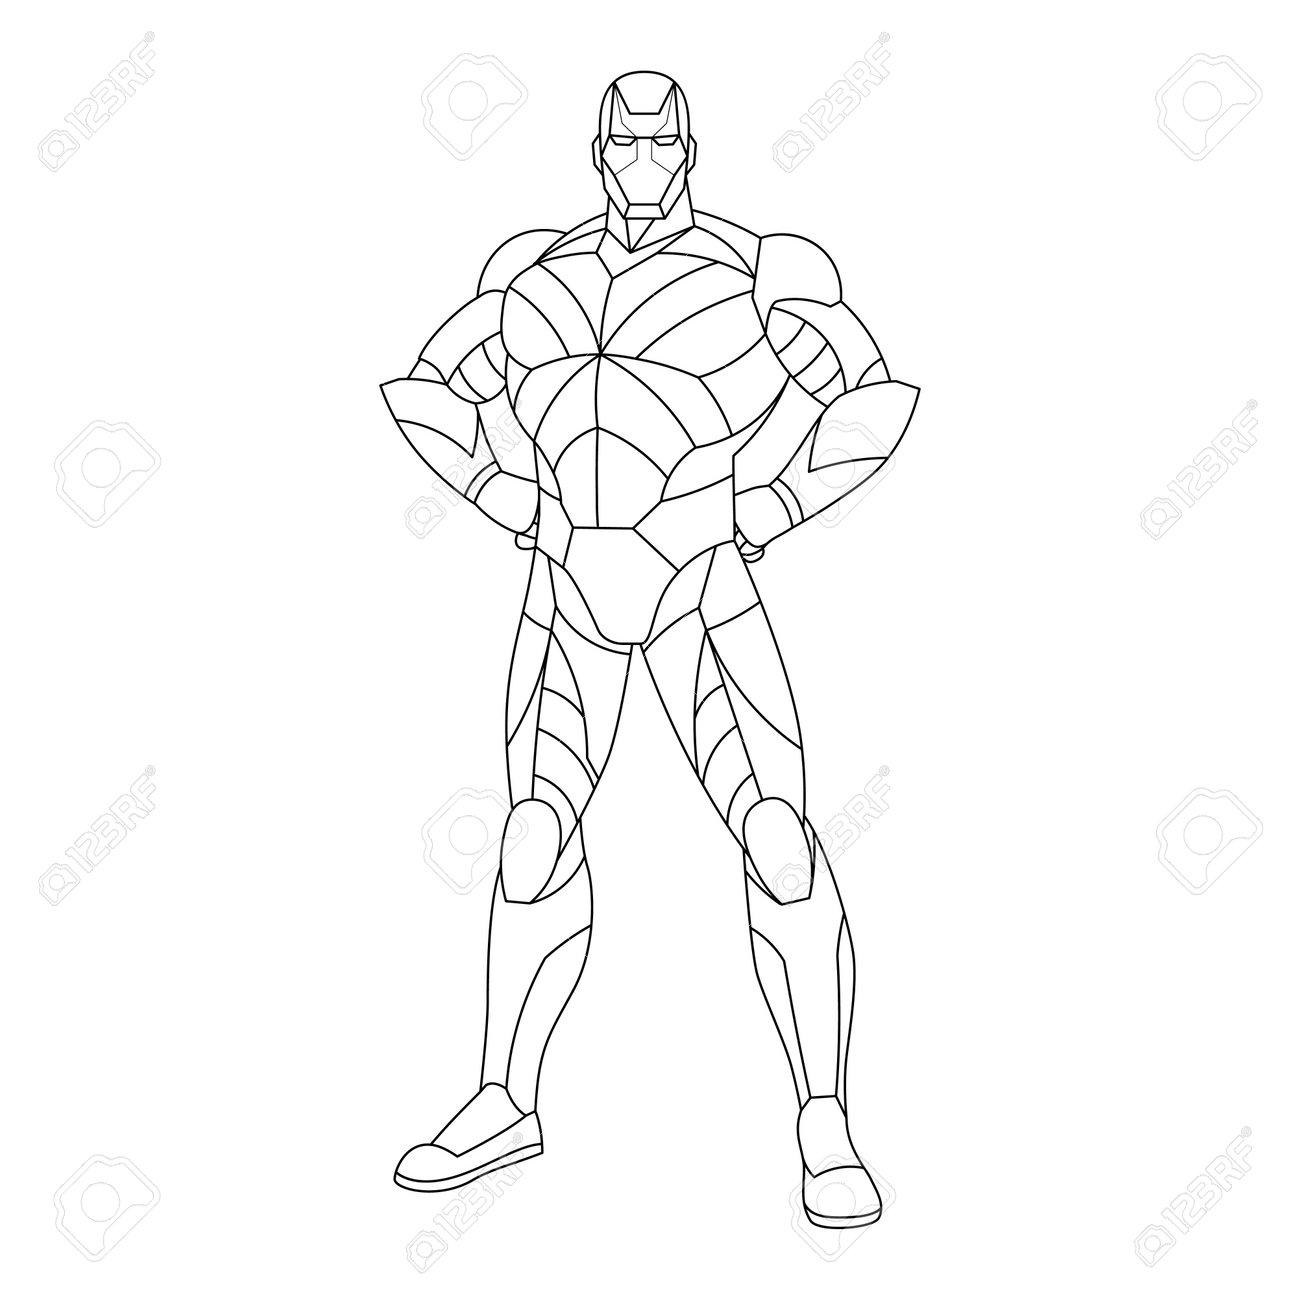 Outline of a superhero cartoon - Vector illustration - 164693166